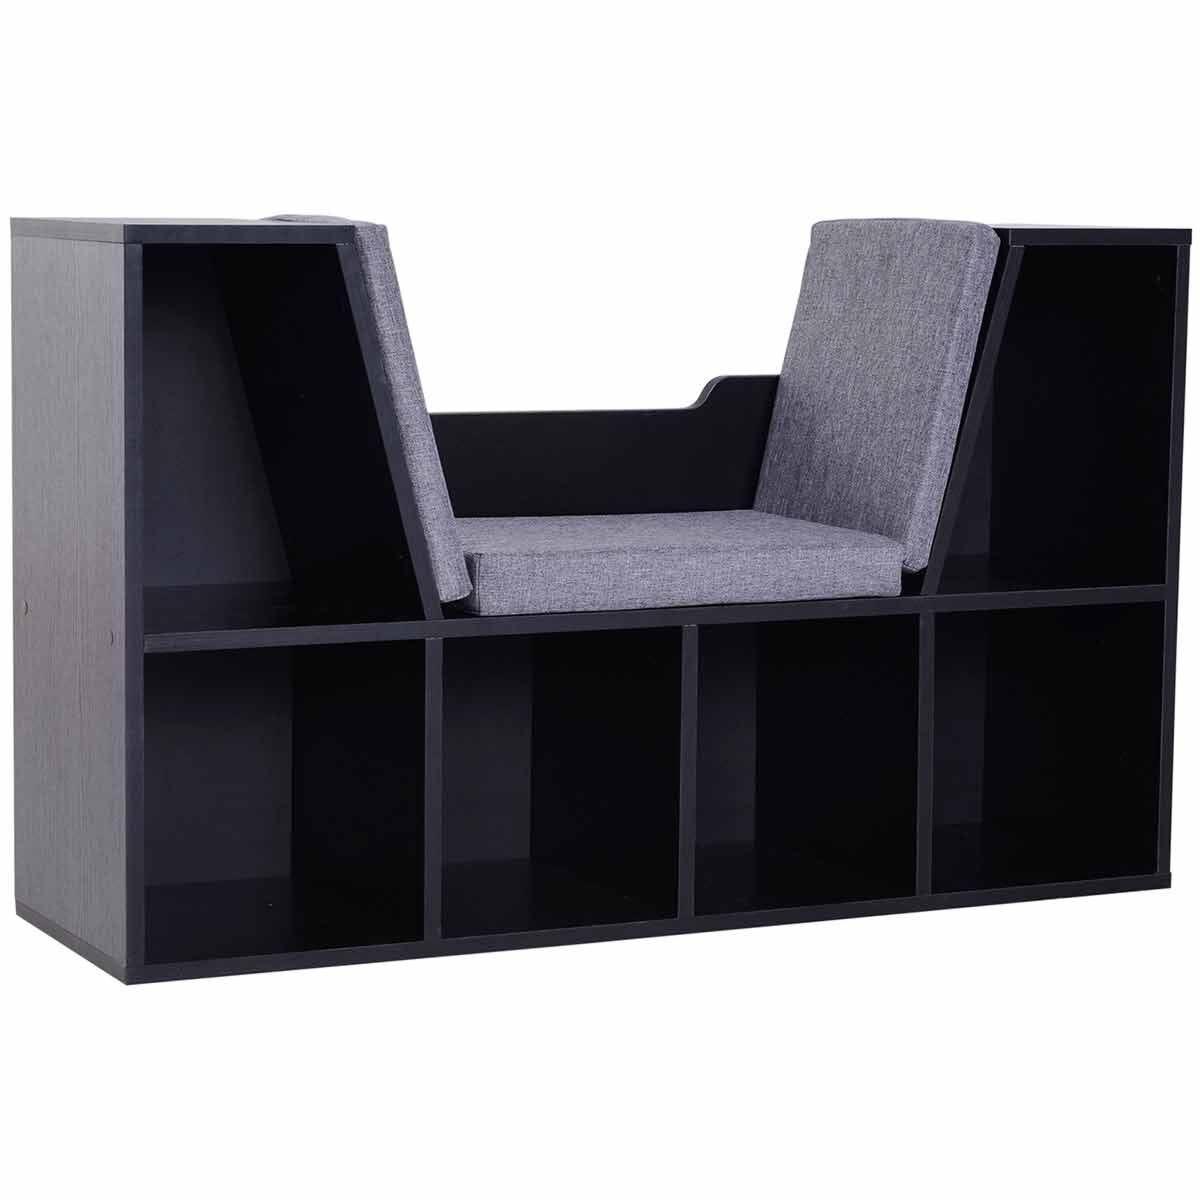 Nash Reading Seat with Storage Black